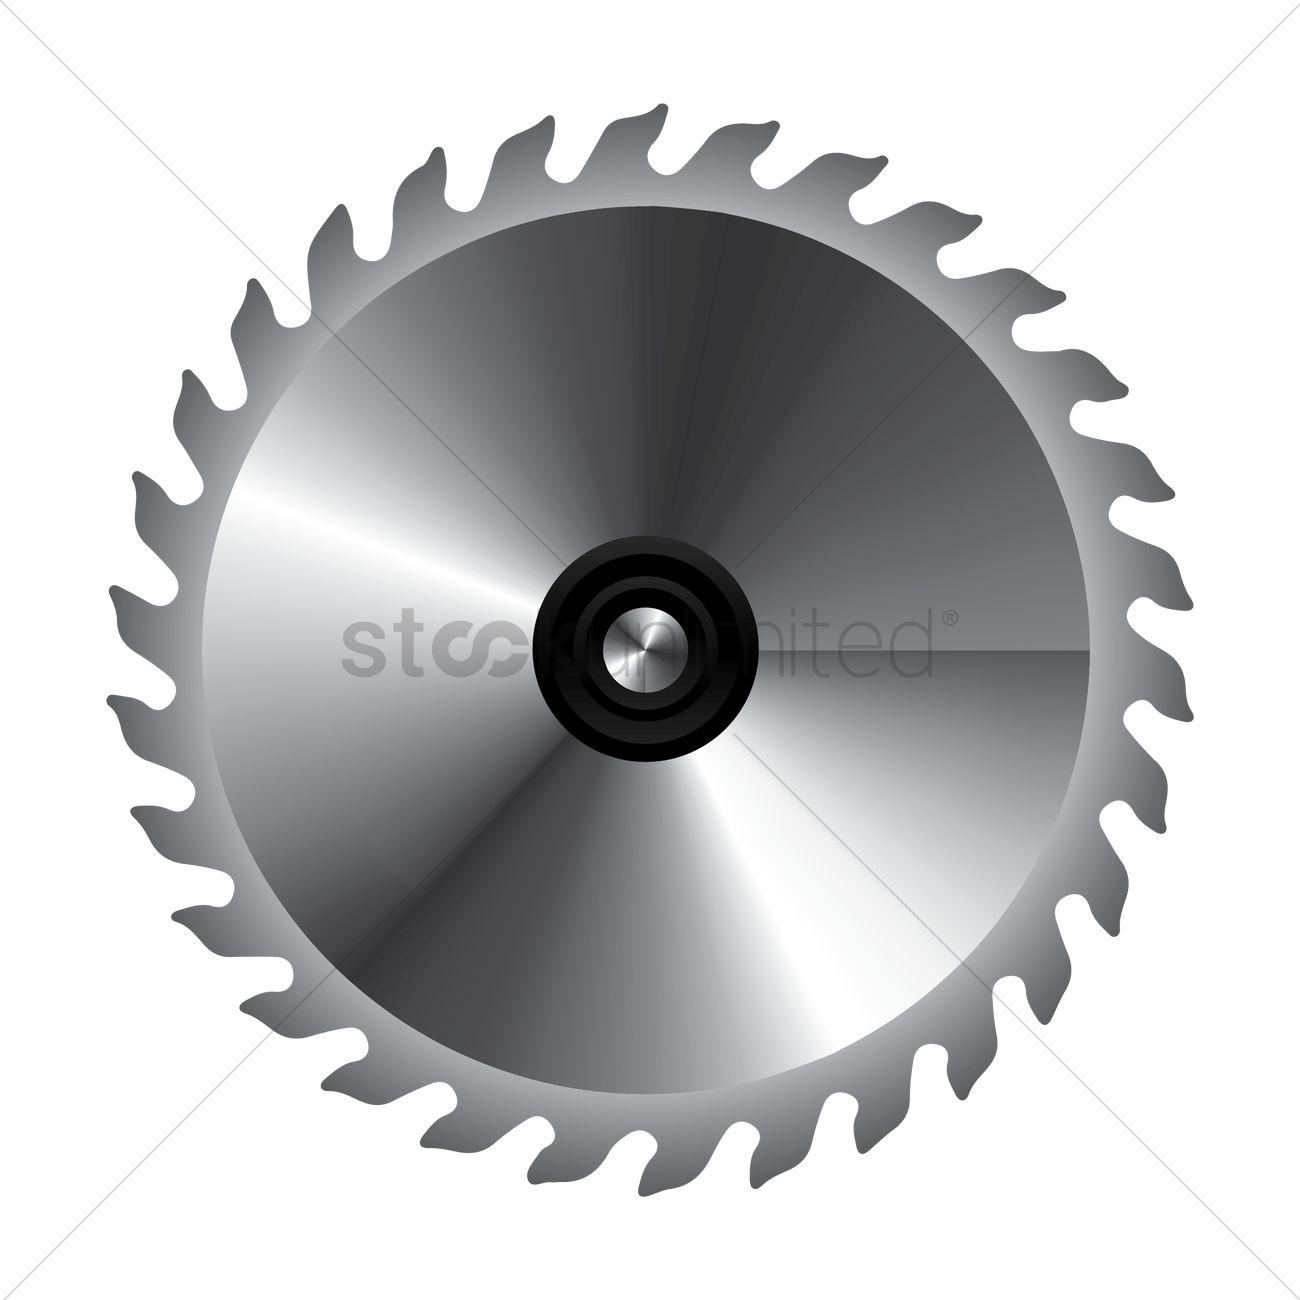 Circular saw blade Vector Image.